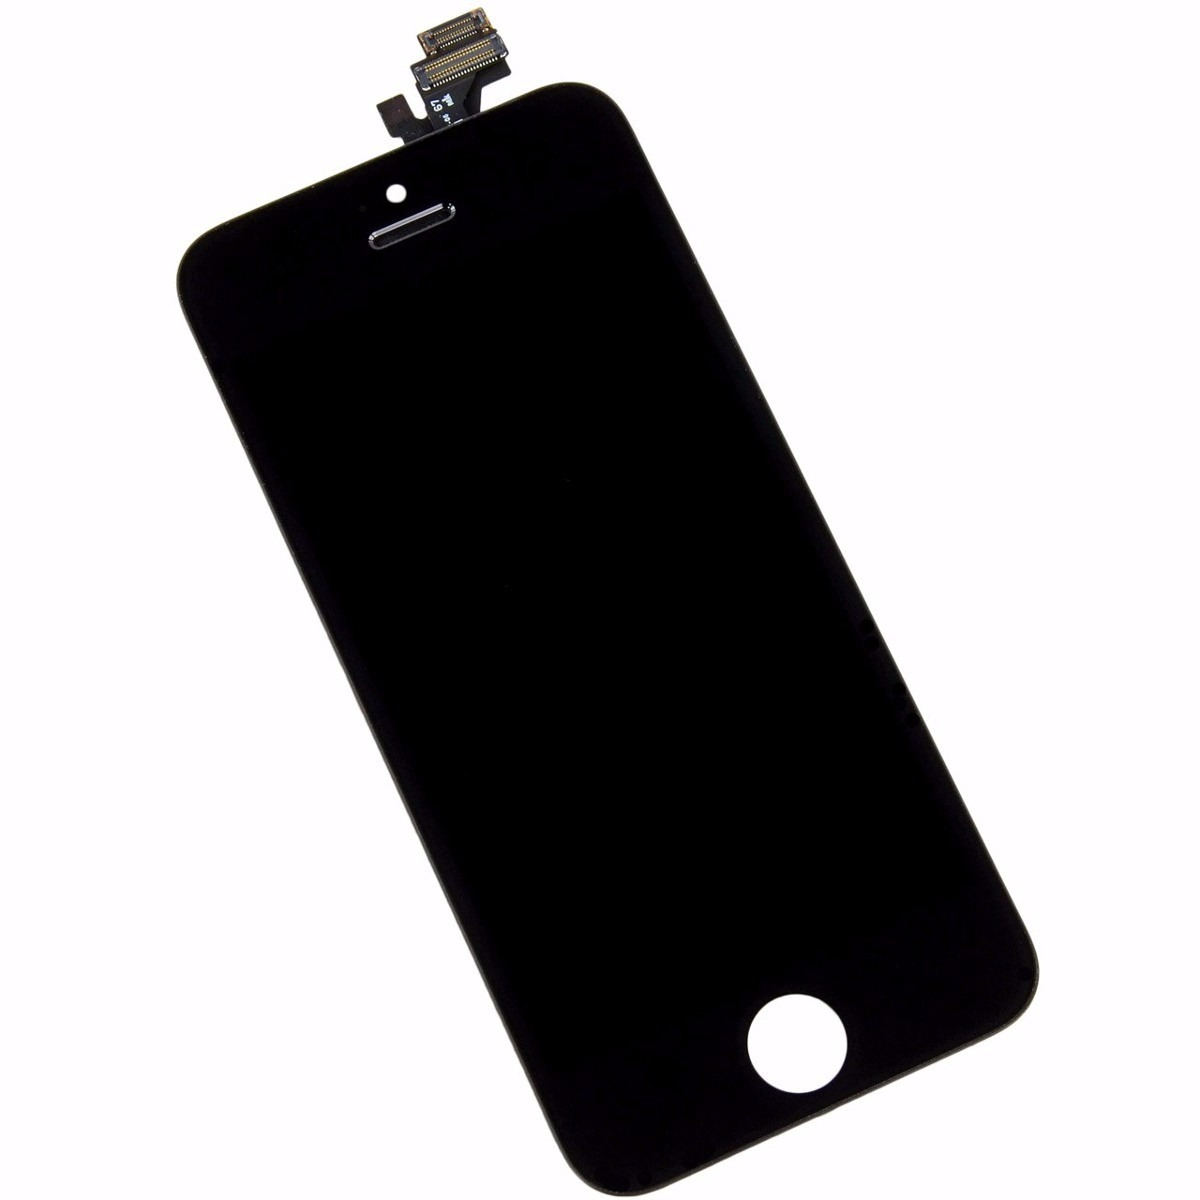 Tela Touch Display Módulo iPhone 5 5G A1428 Preto